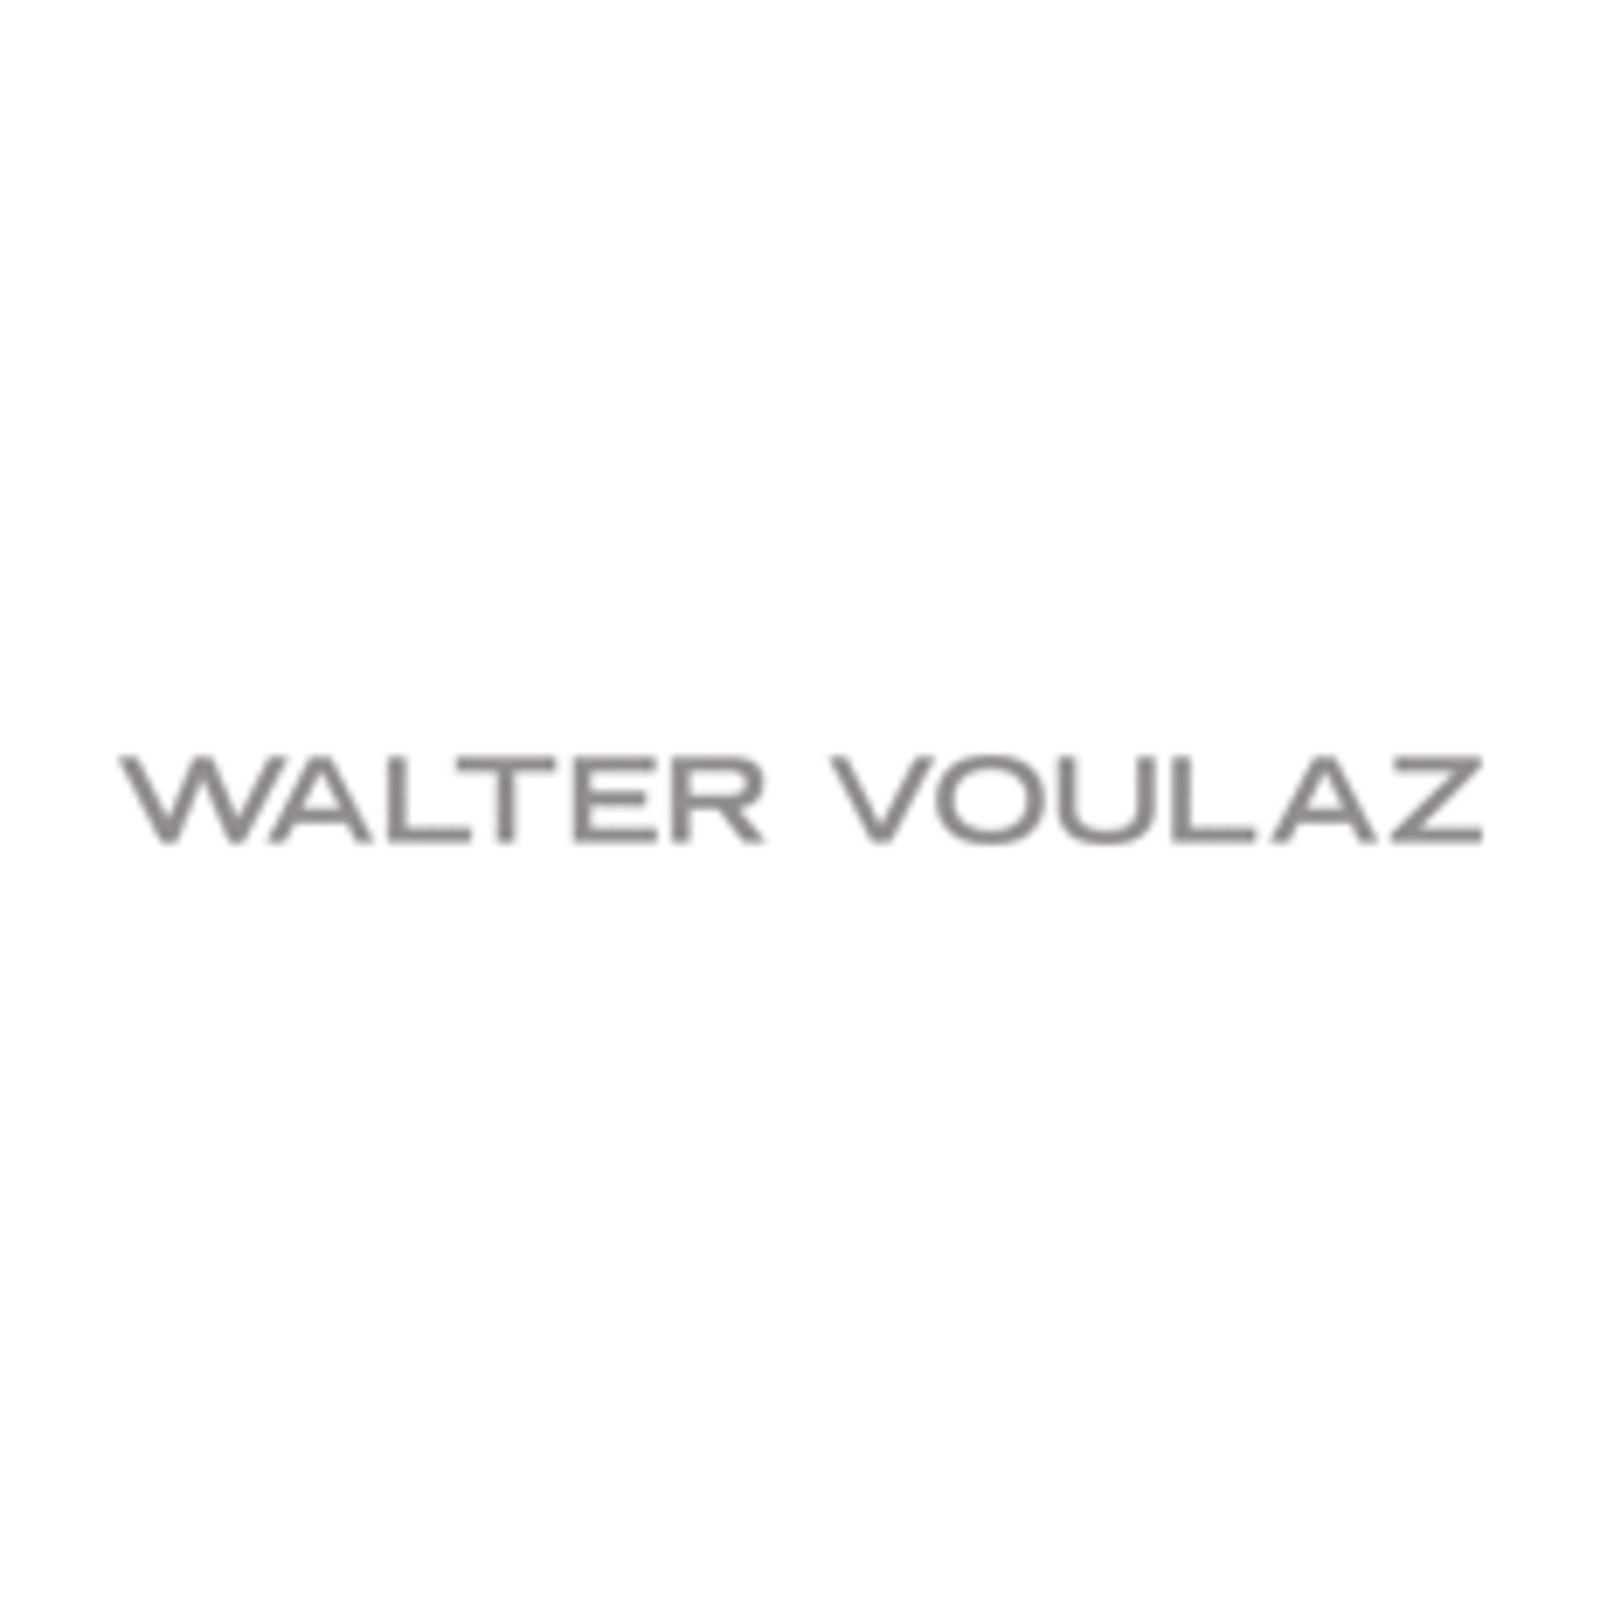 WALTER VOULAZ (Bild 1)